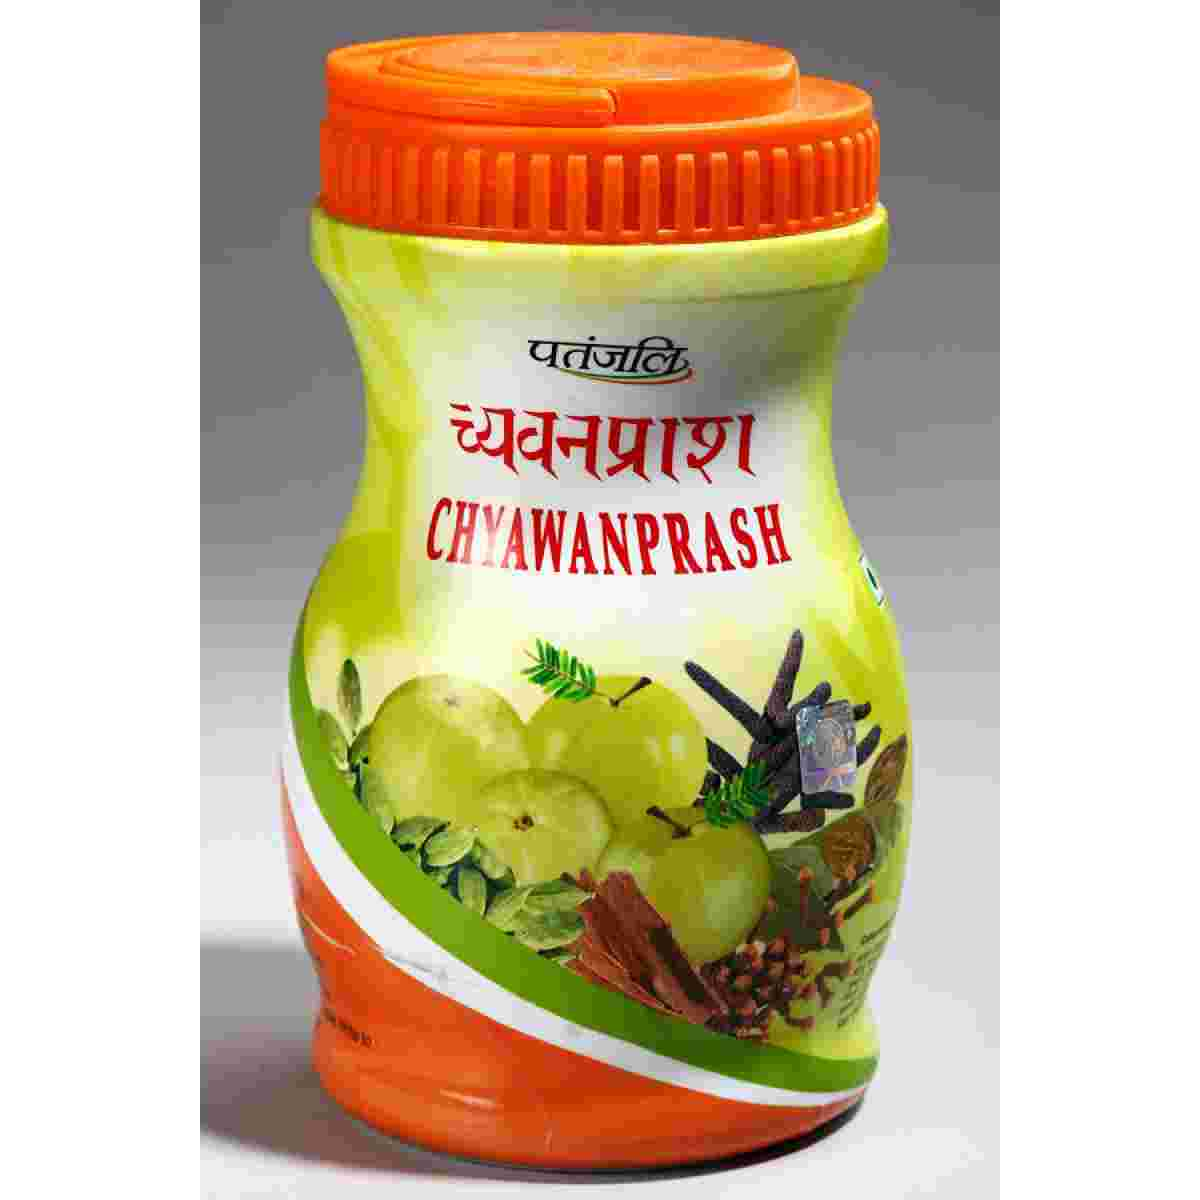 Patanjali chyawanprash 1kg